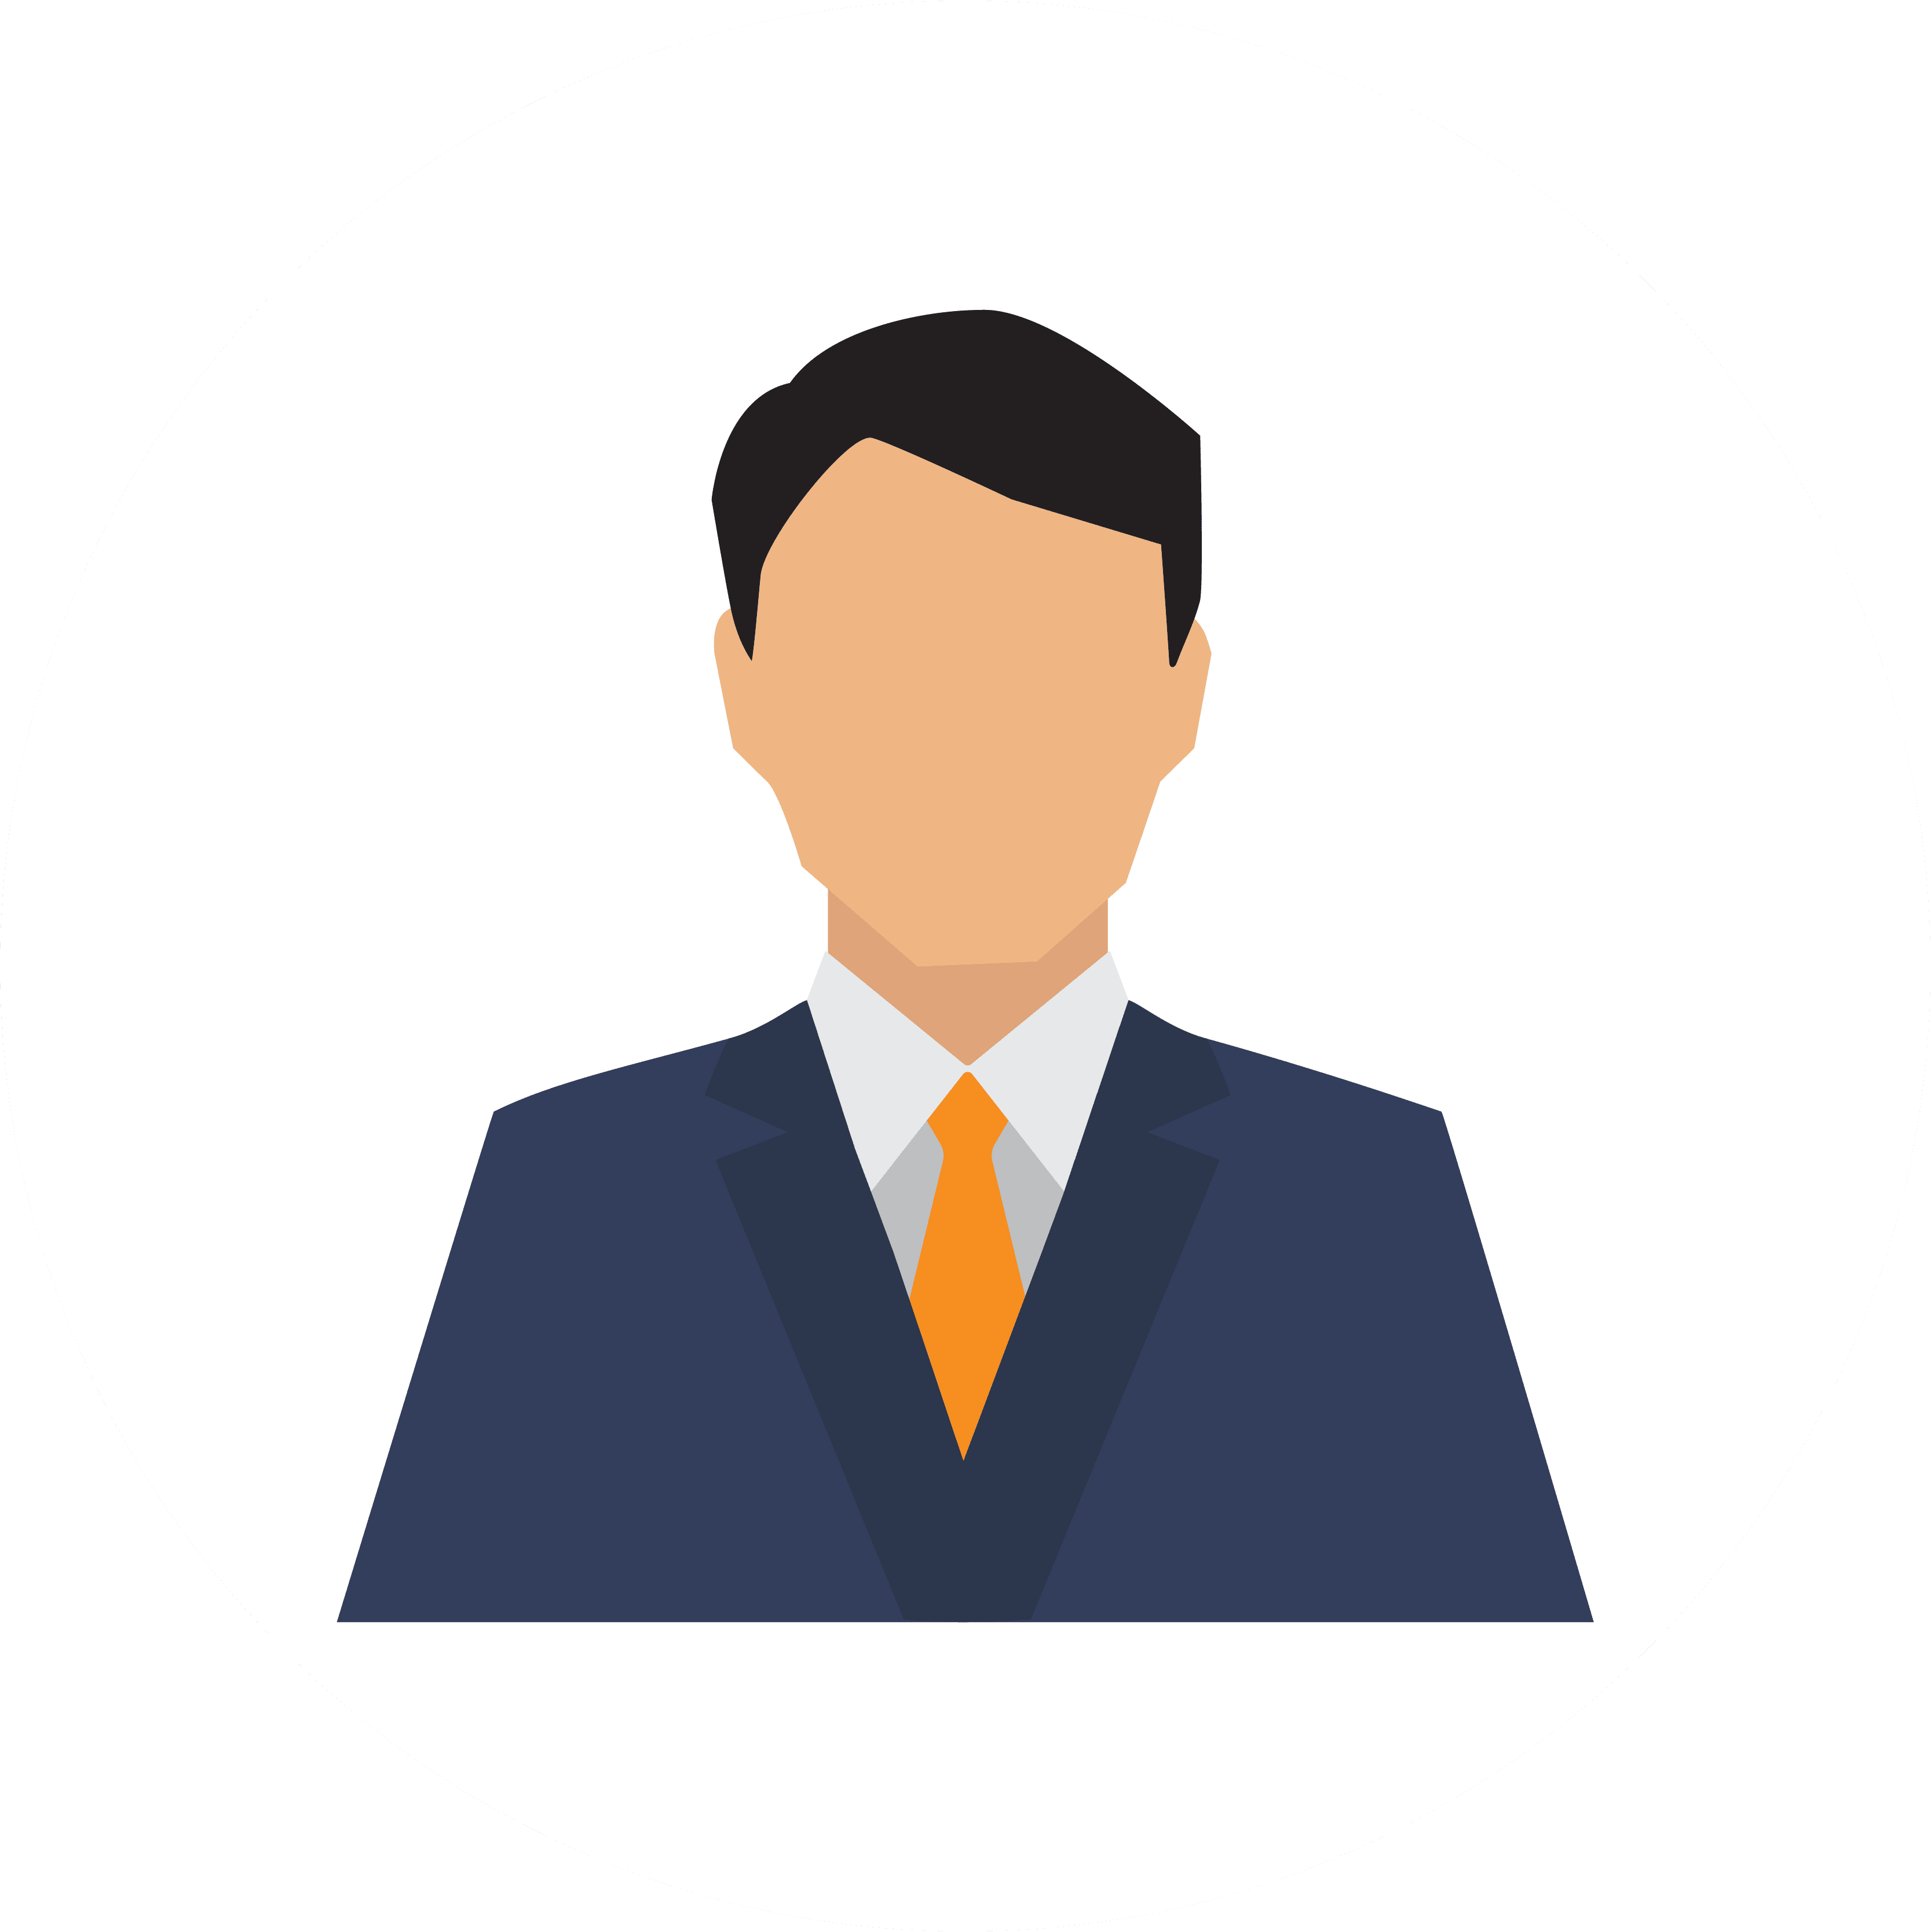 Email Marketing Kickstarter - 8